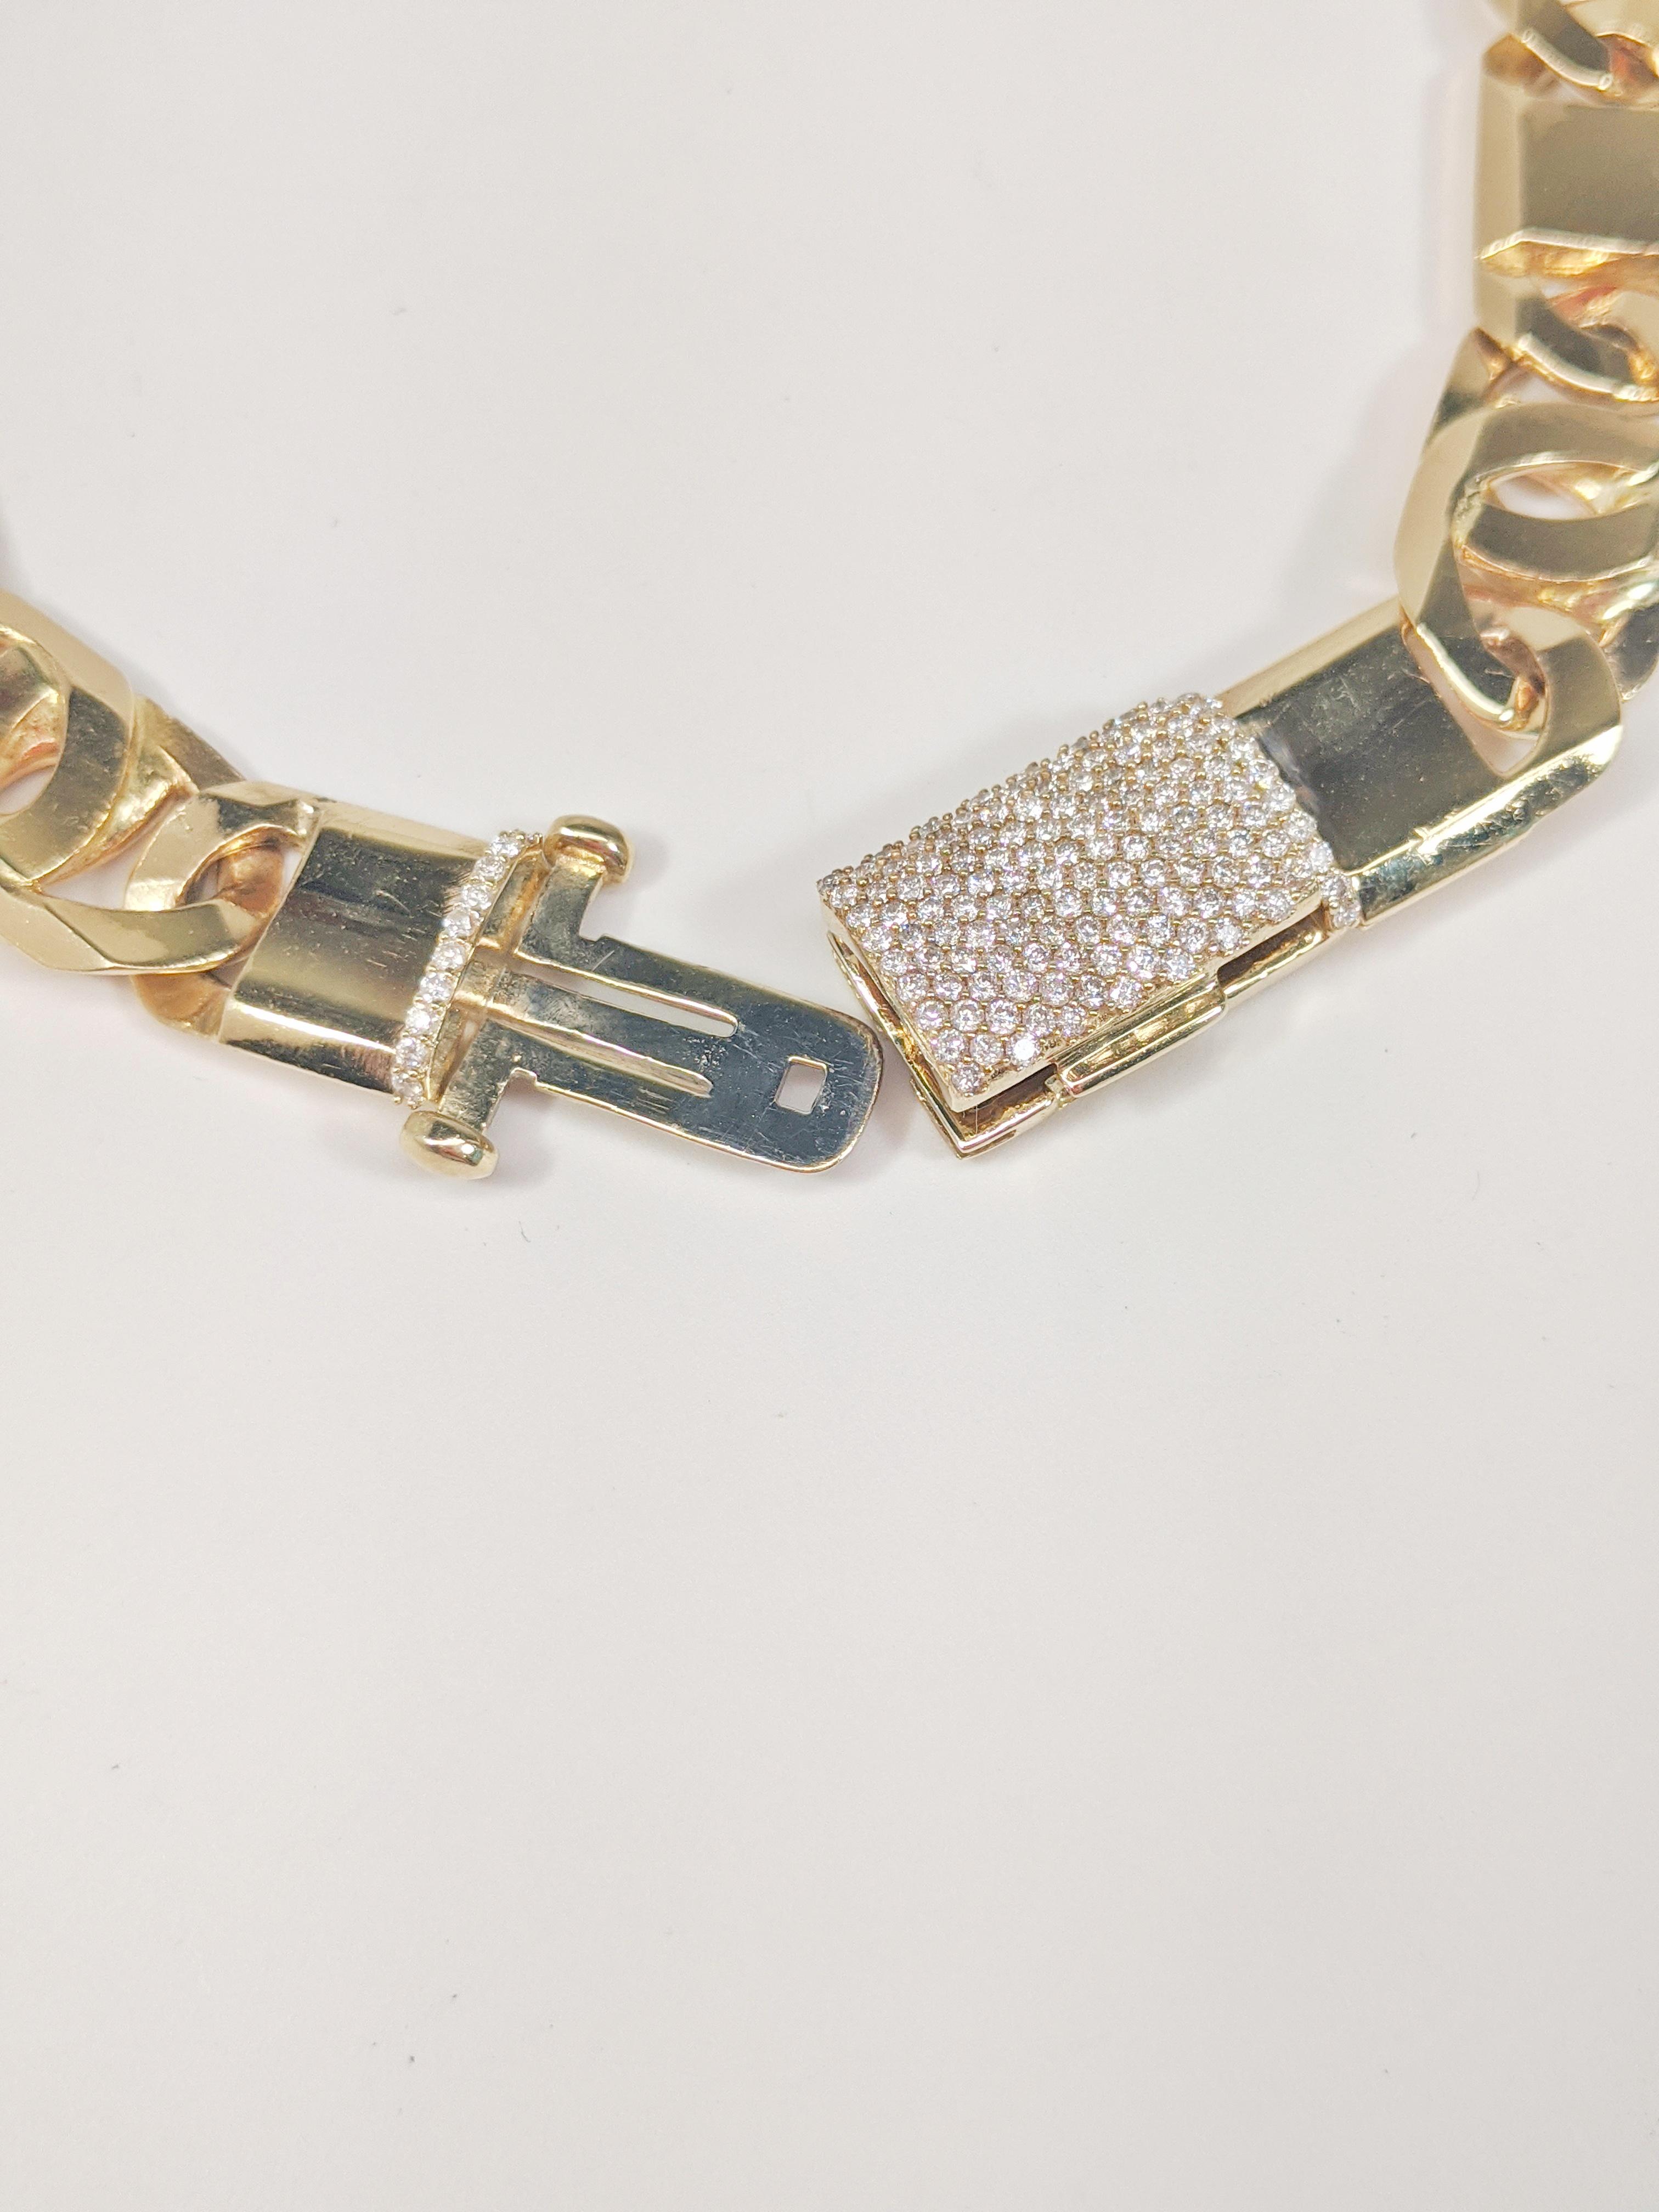 14KT Yellow Gold Solid Heavy Fancy Tiger Eye Link Chain, Hand Made Italian Chain 12MM wide, VVS Pave Diamond Lock, Cuban Box Lock, Open Lock A